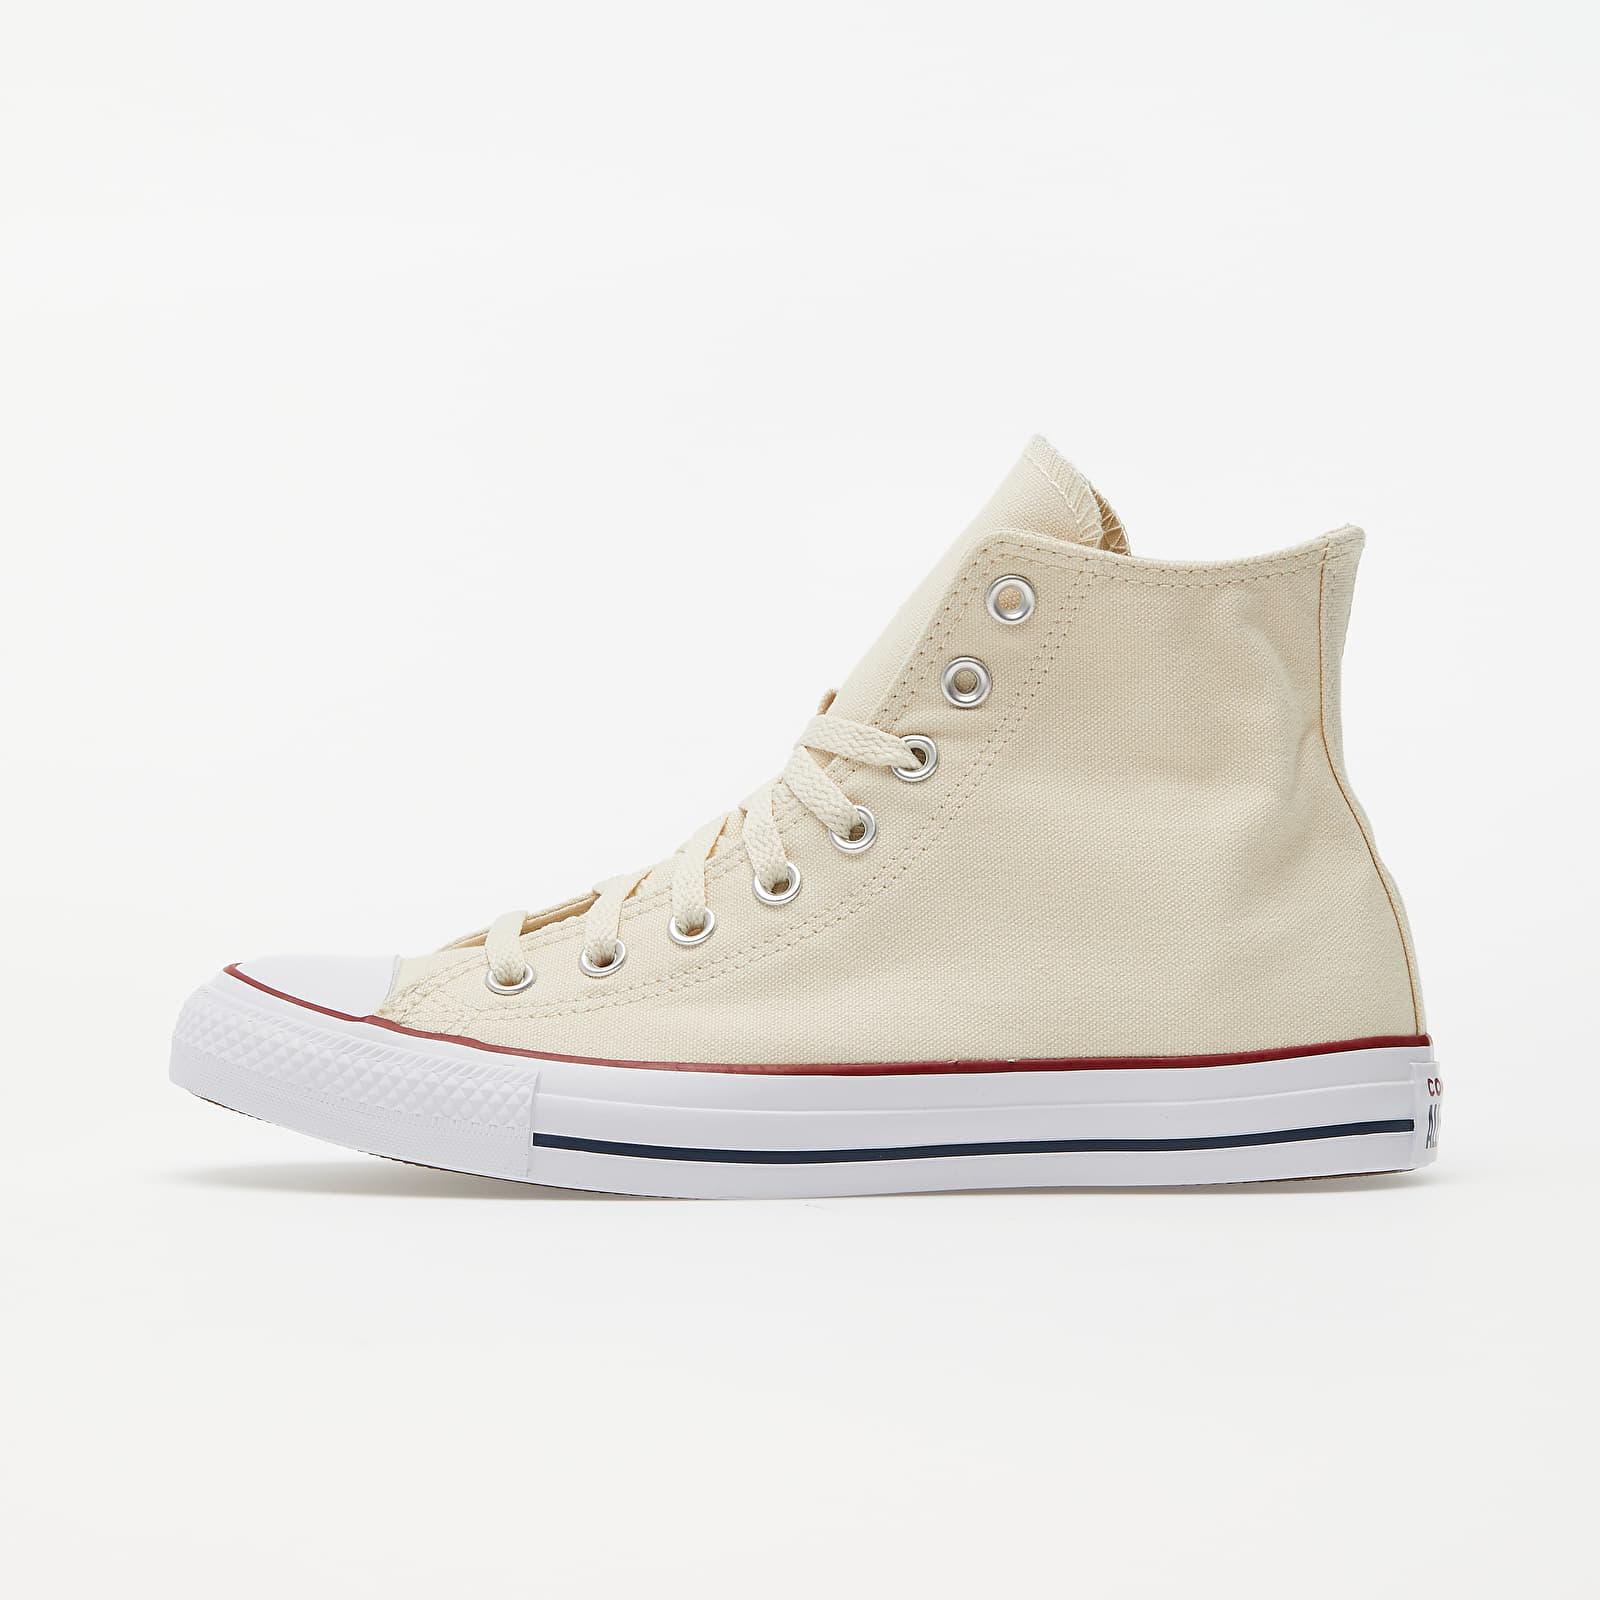 Férfi cipők Converse Chuck Taylor All Star Natural